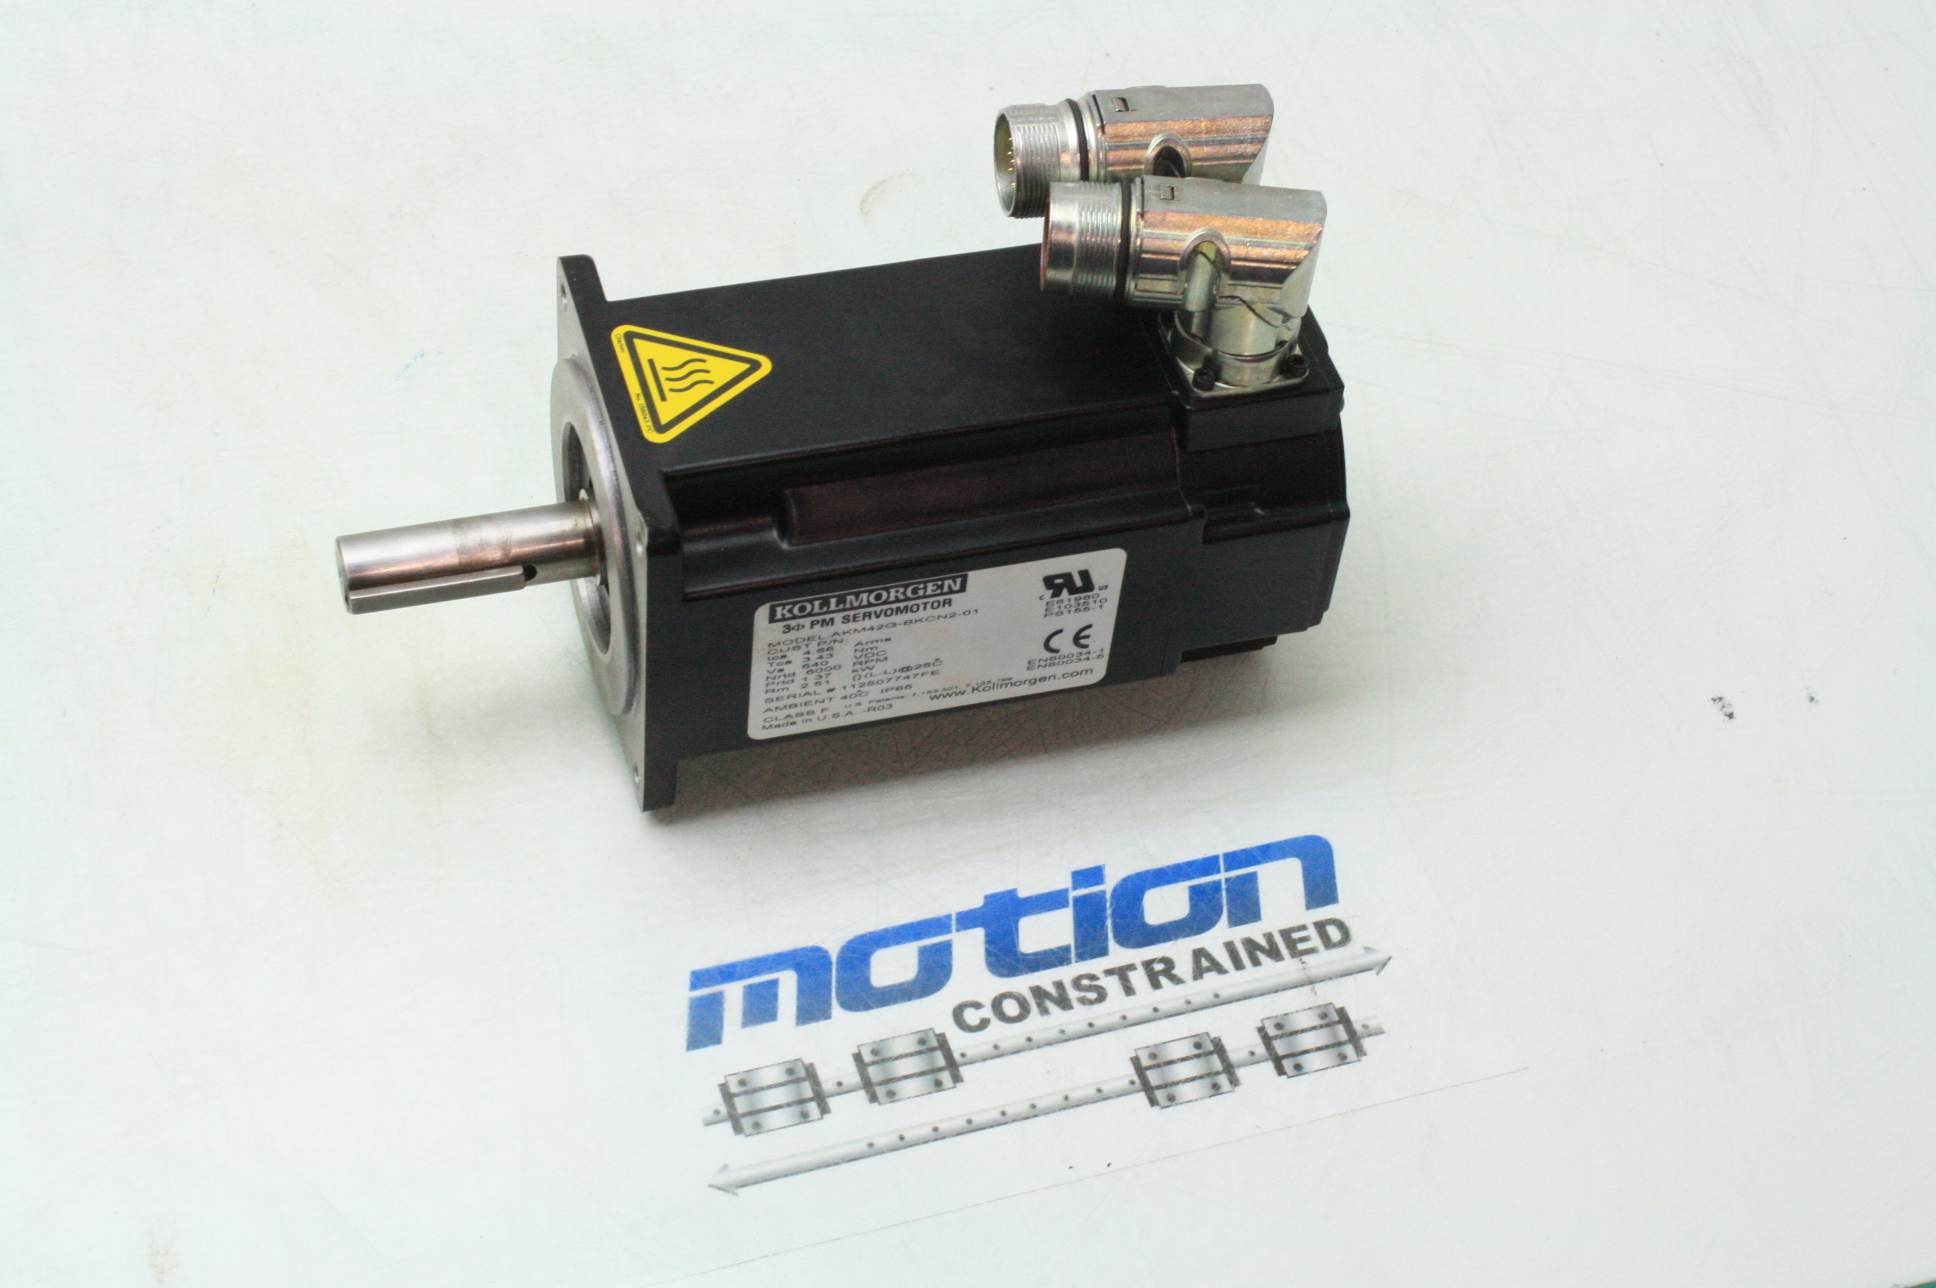 Danaher kollmorgen akm42g bkcn2 01 brushless ac servo for 6000 rpm ac motor